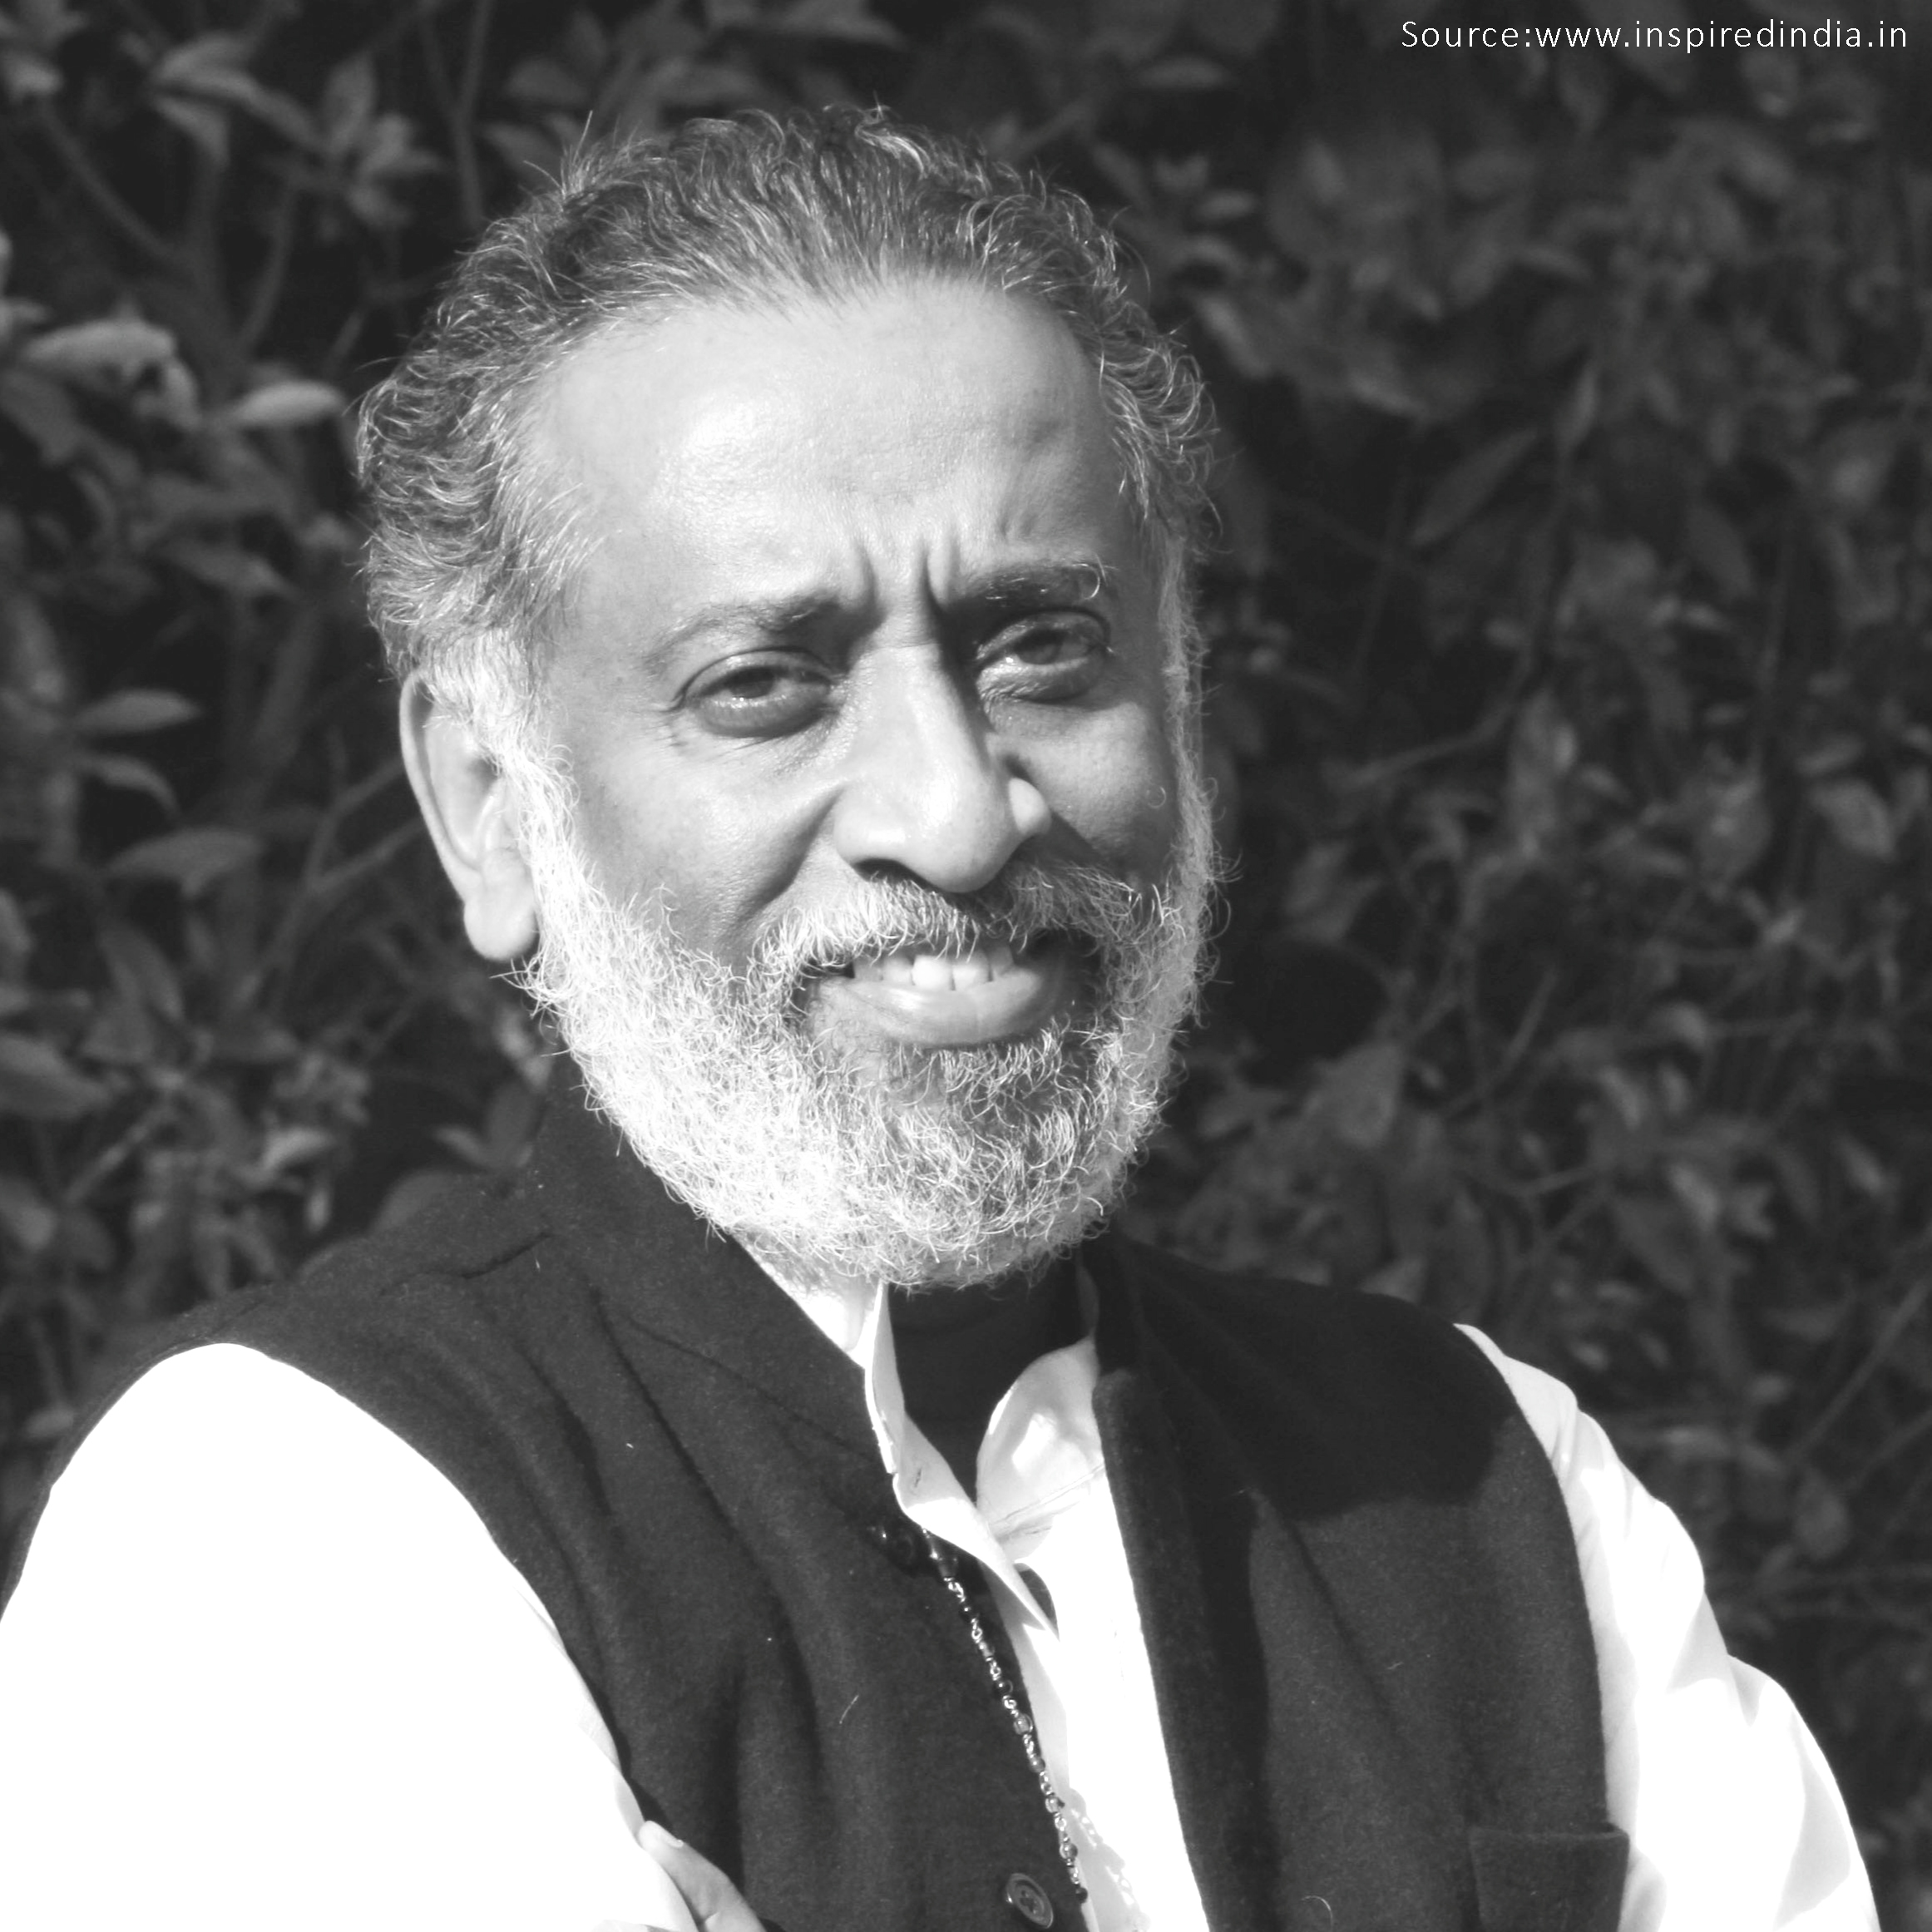 Dilip Cherian